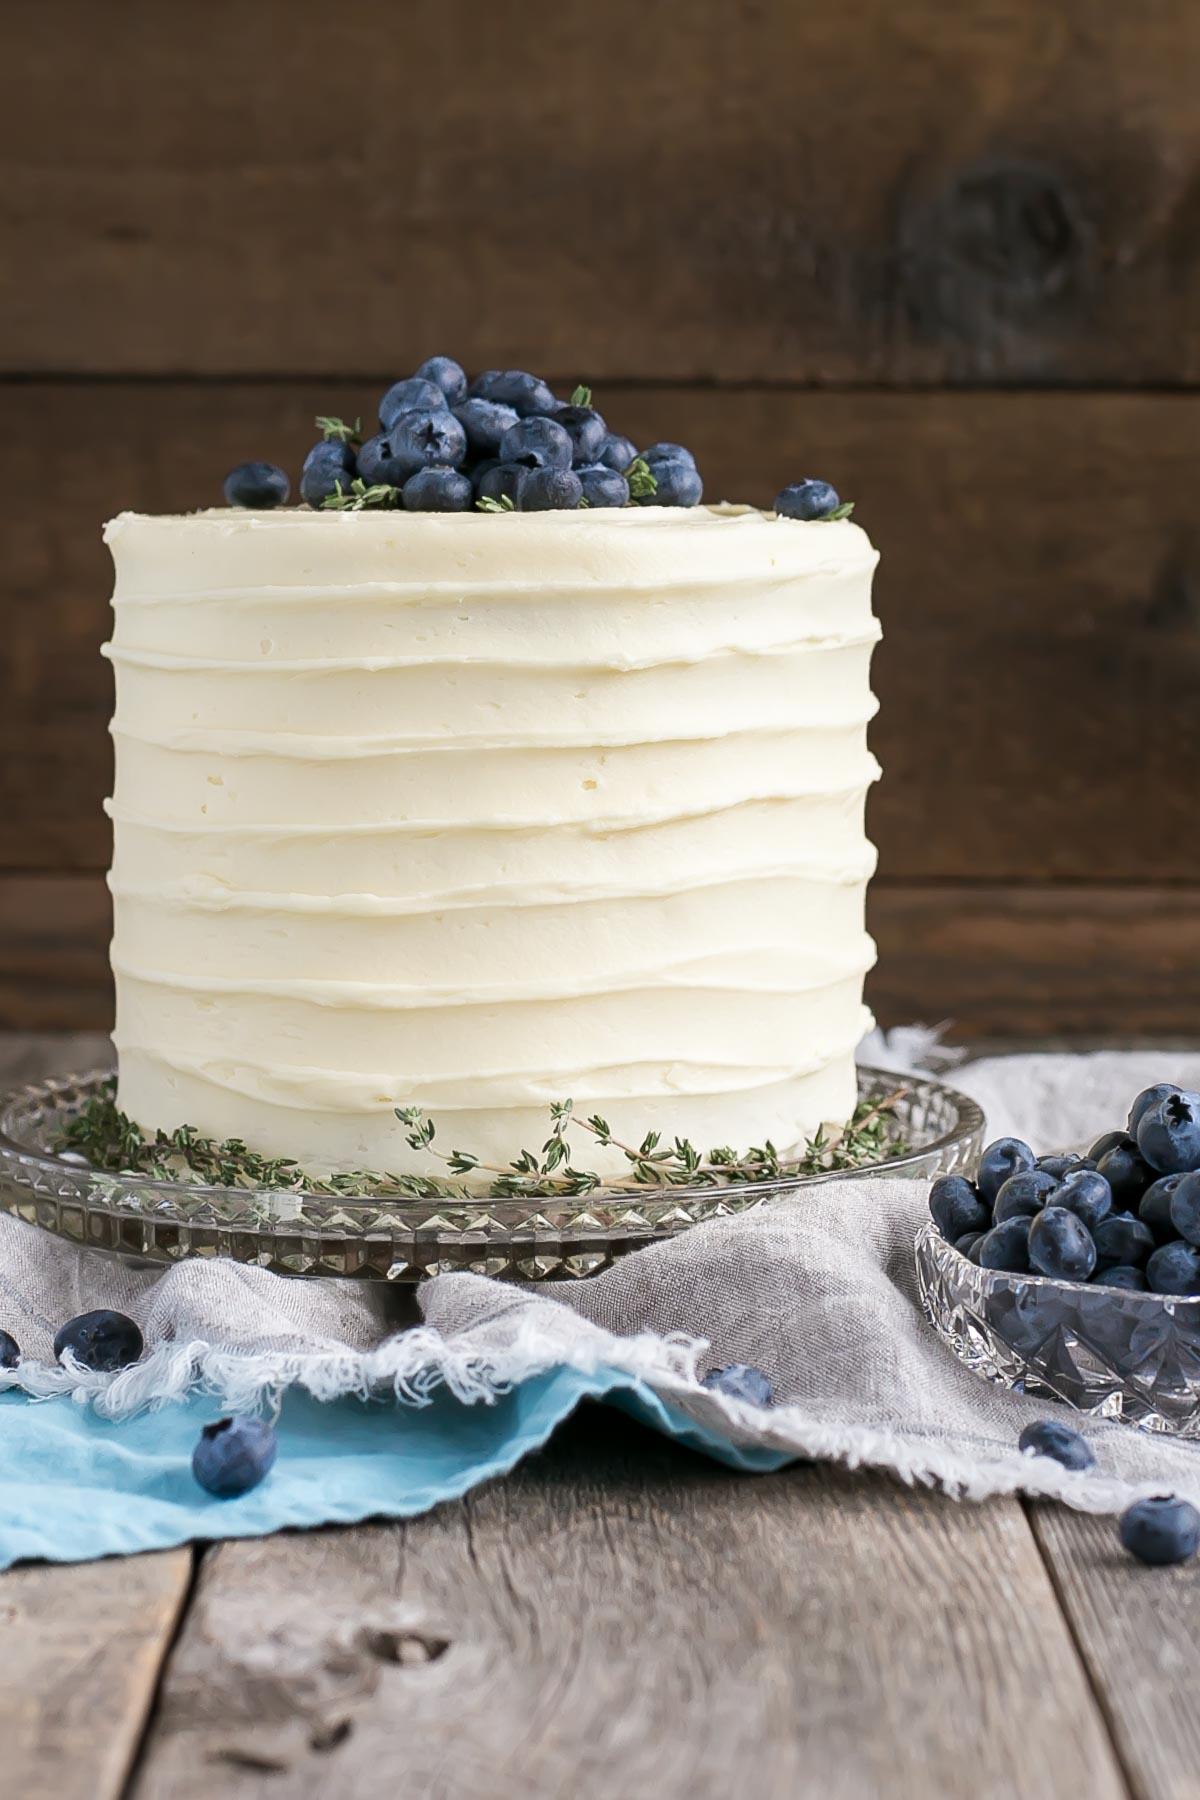 Banana Cake recipe with fresh blueberries.